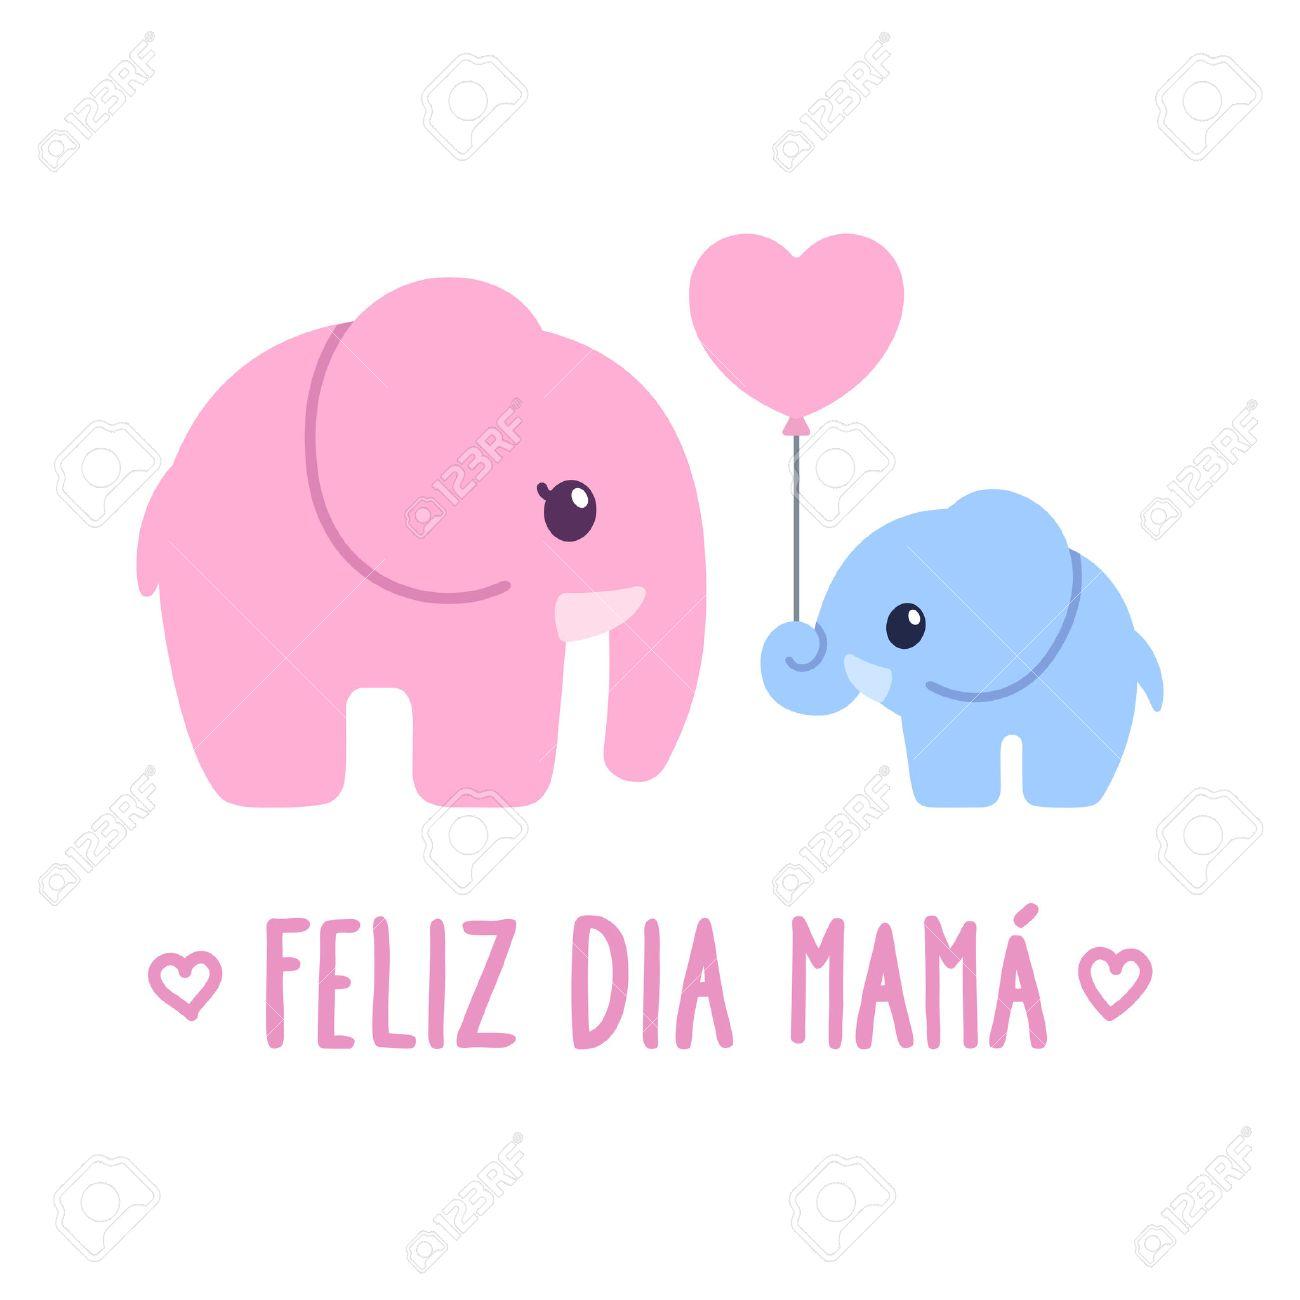 feliz dia mama spanish for happy mother s day cute cartoon